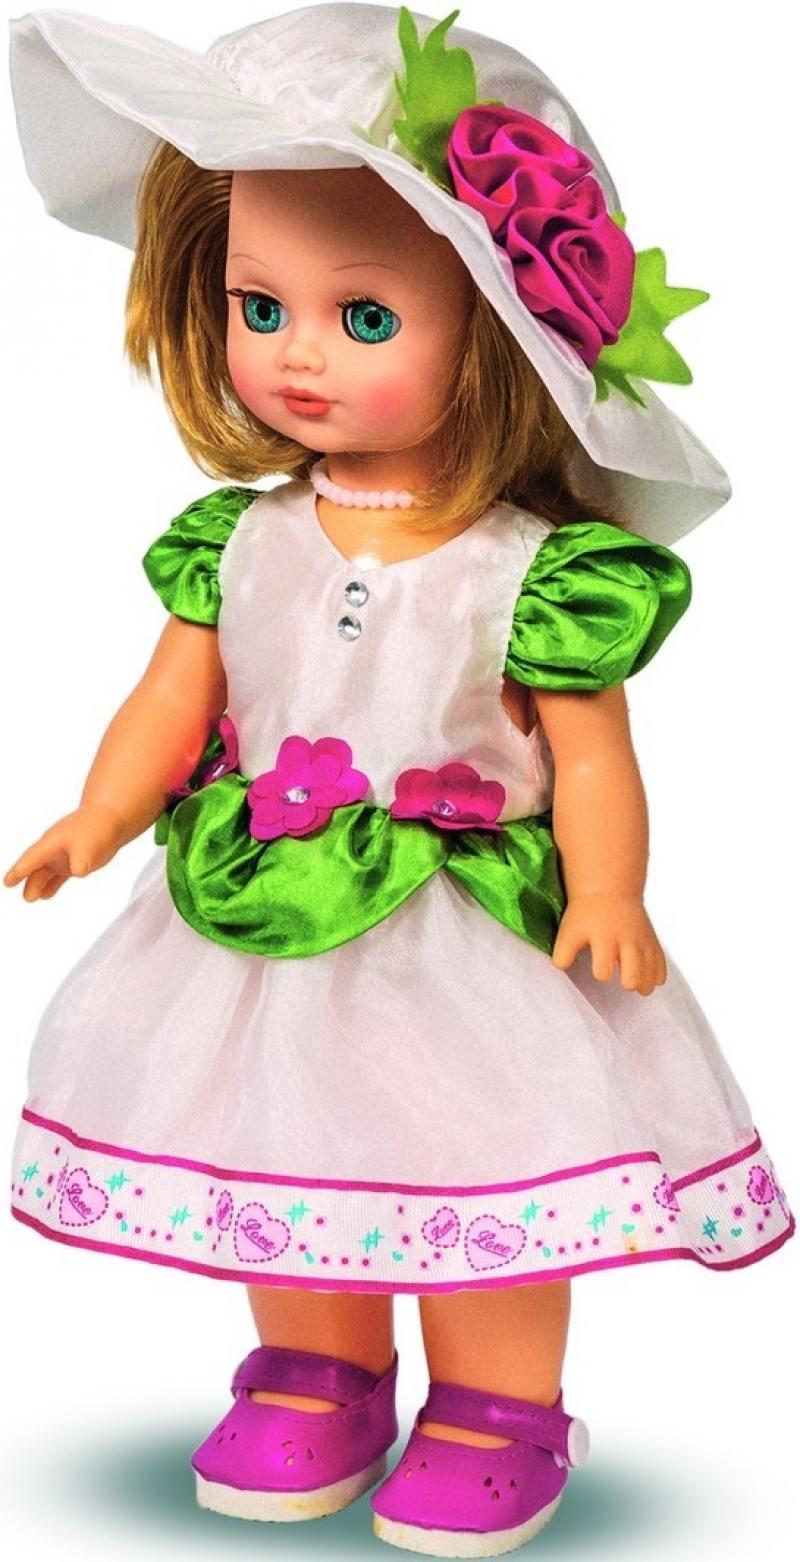 Кукла ВЕСНА Элла 16 звук , 35 см. кукла алла весна